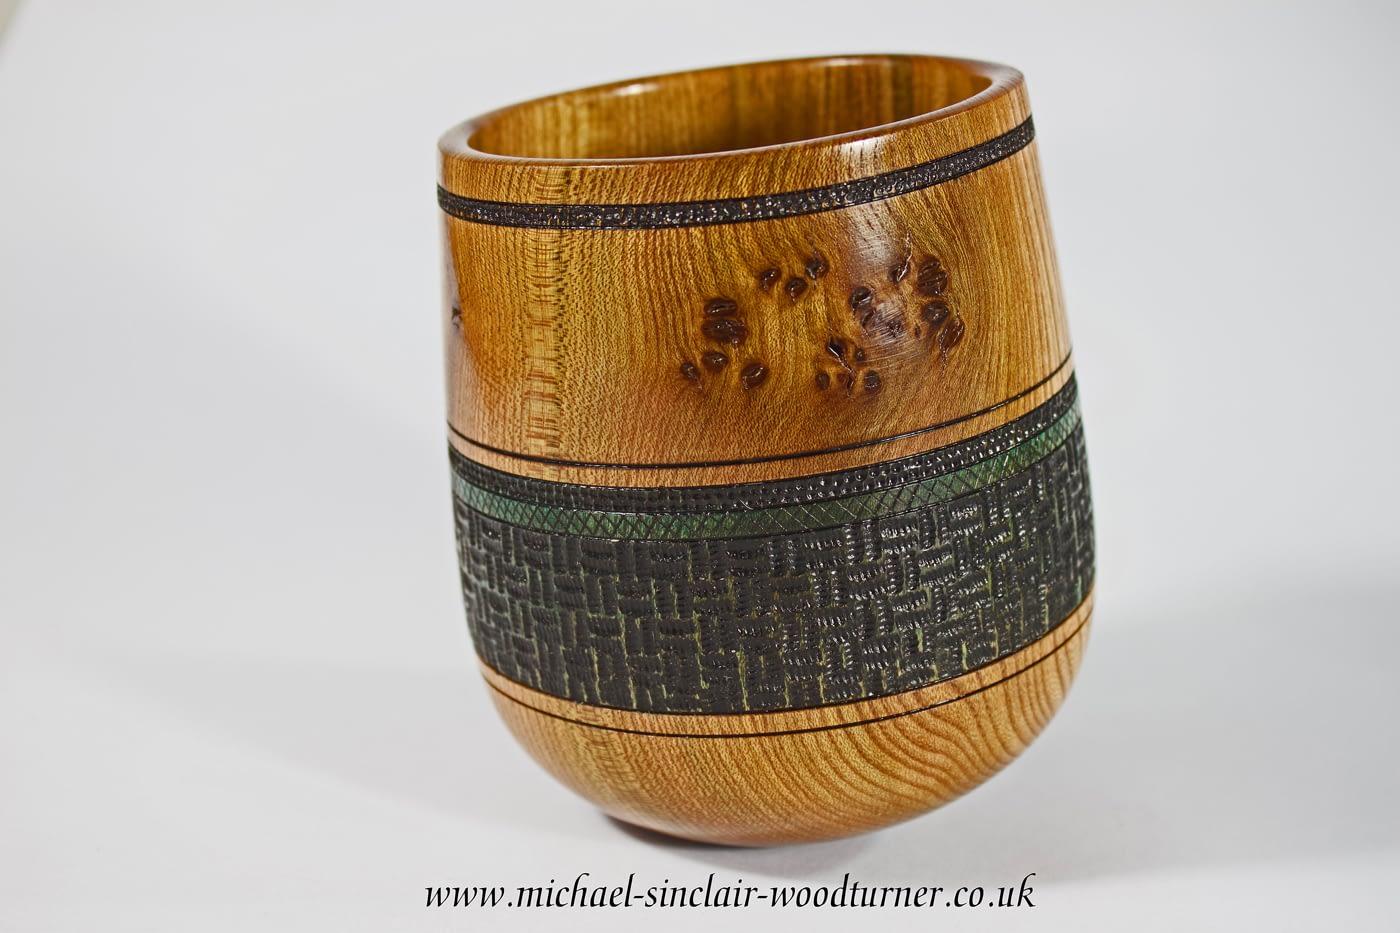 Wooden turned 'Rocking' bowls